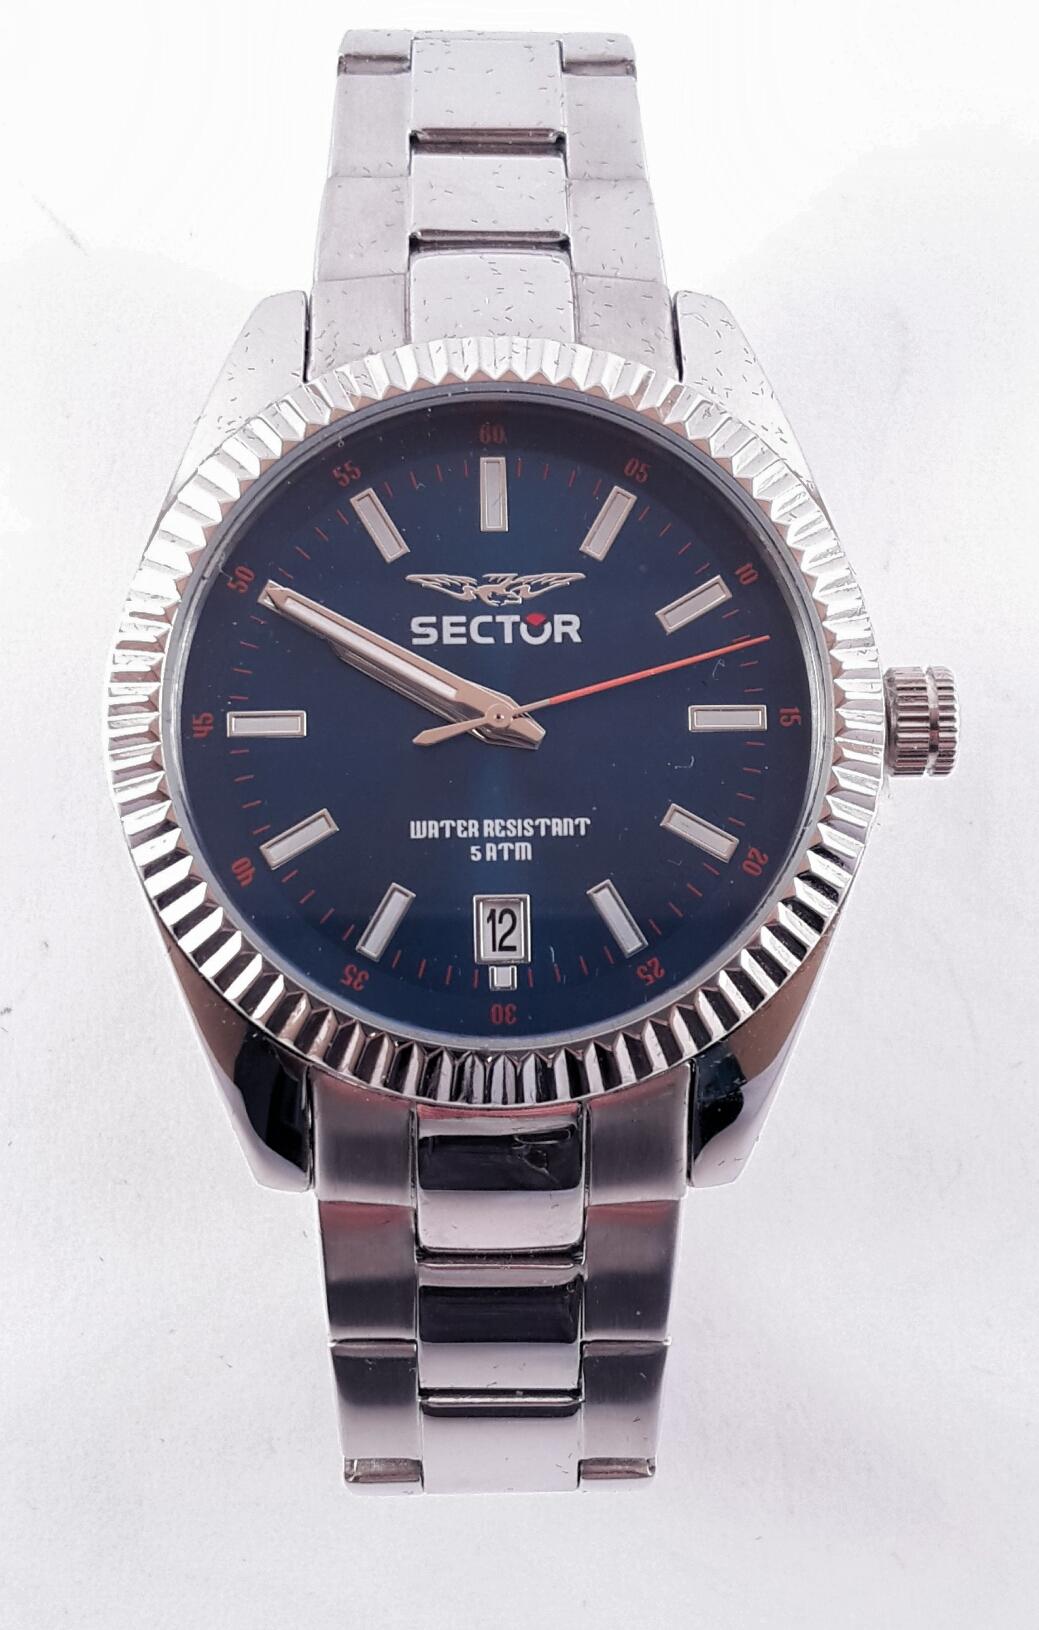 OROLOGIO SECTOR 240 ref R3253476002